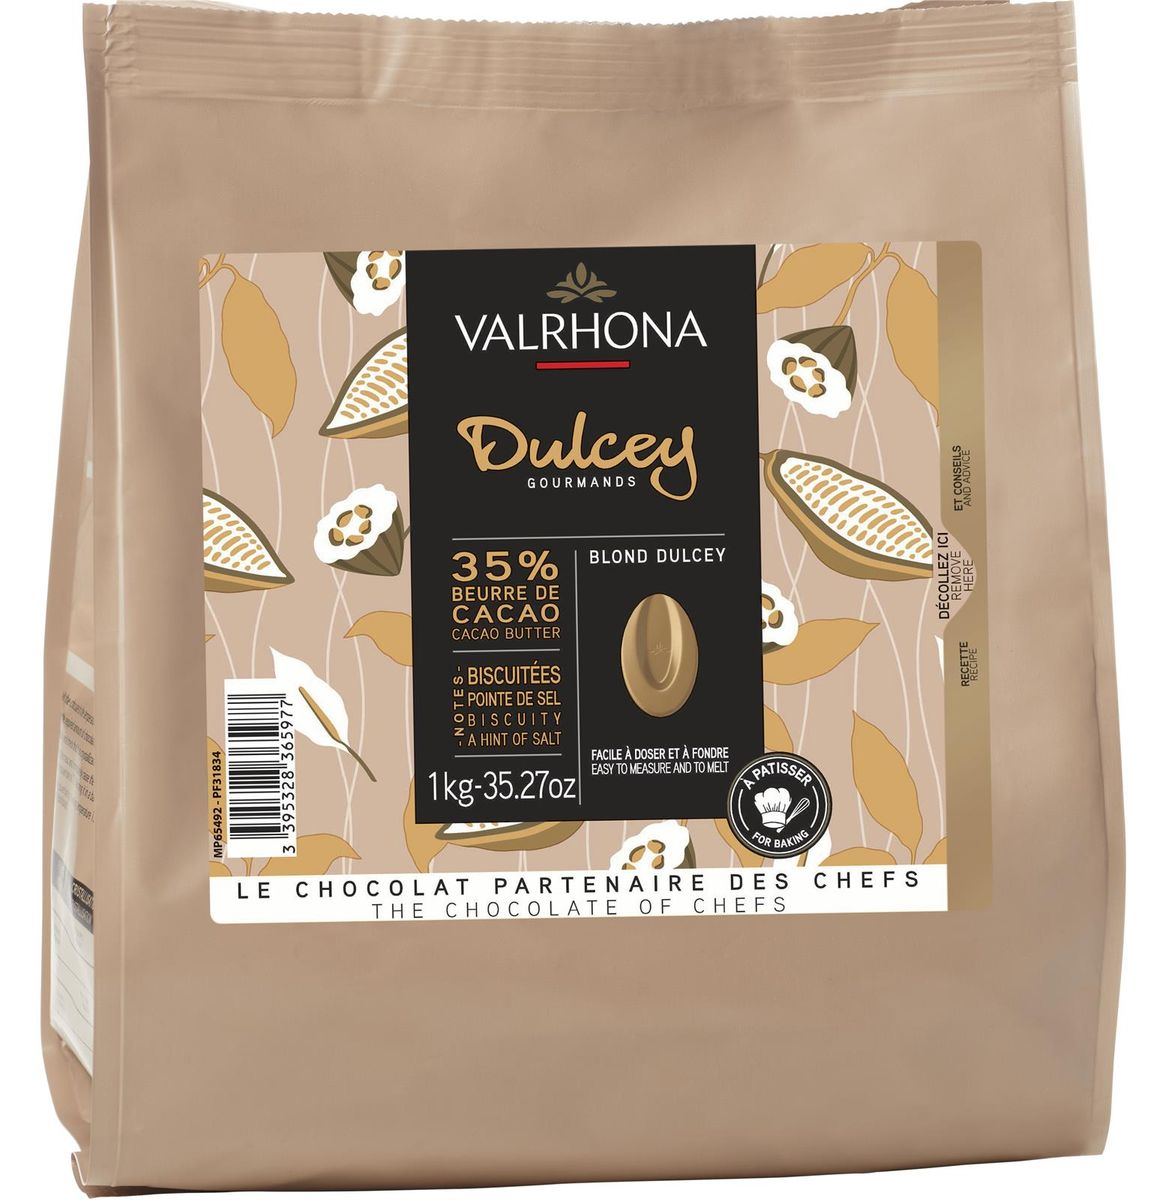 SAC DE FEVES CHOCOLAT DULCEY 32% 1 KG - VALRHONA